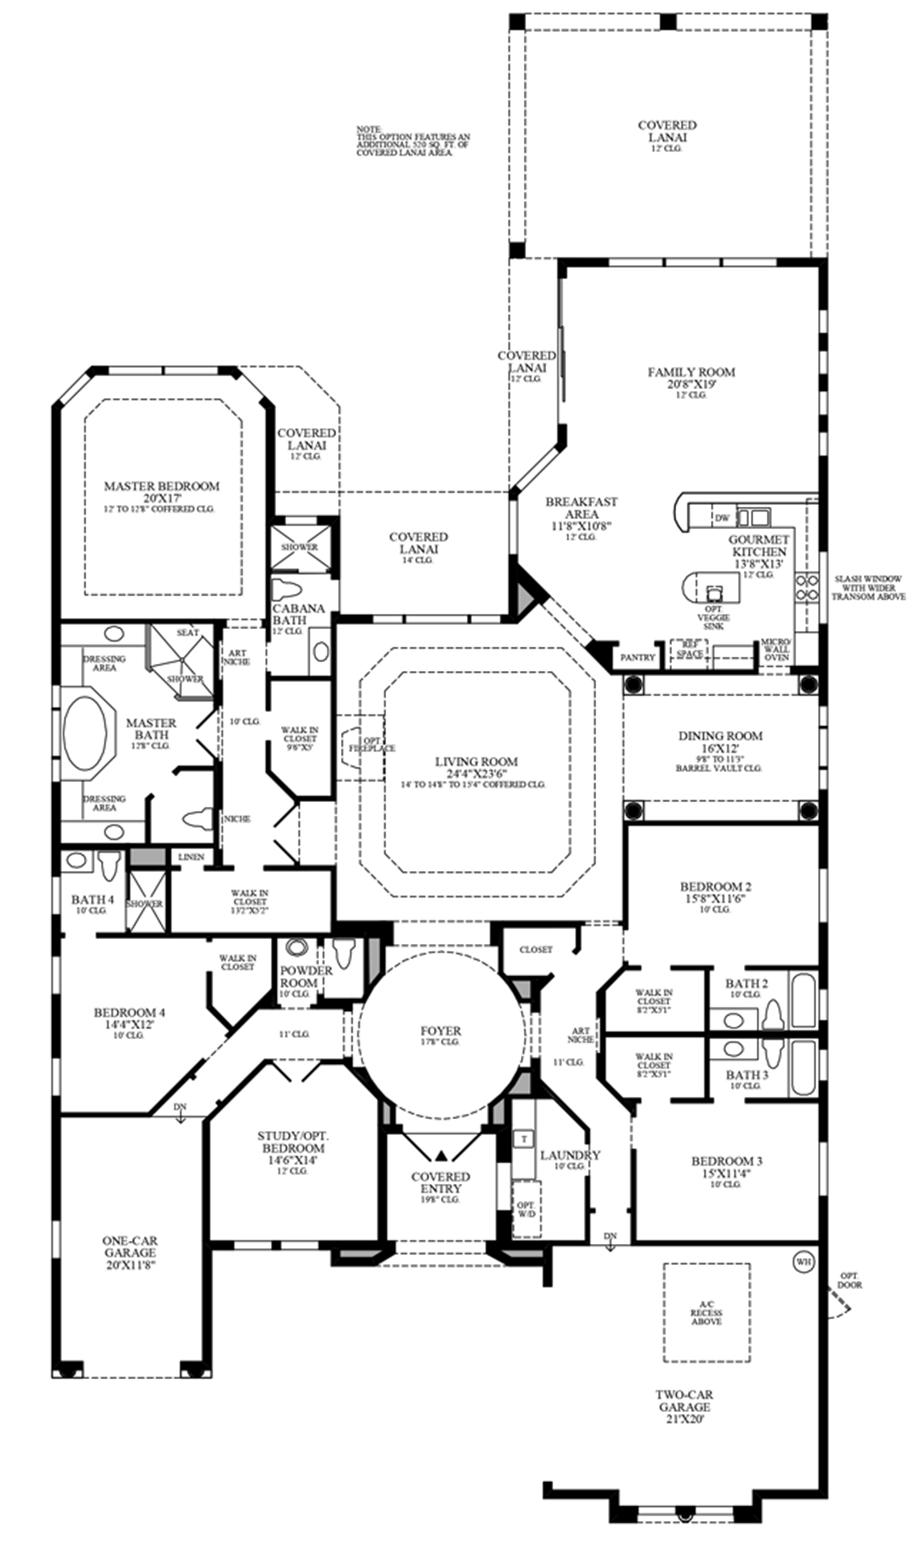 Optional Additional Lanai Floor Plan